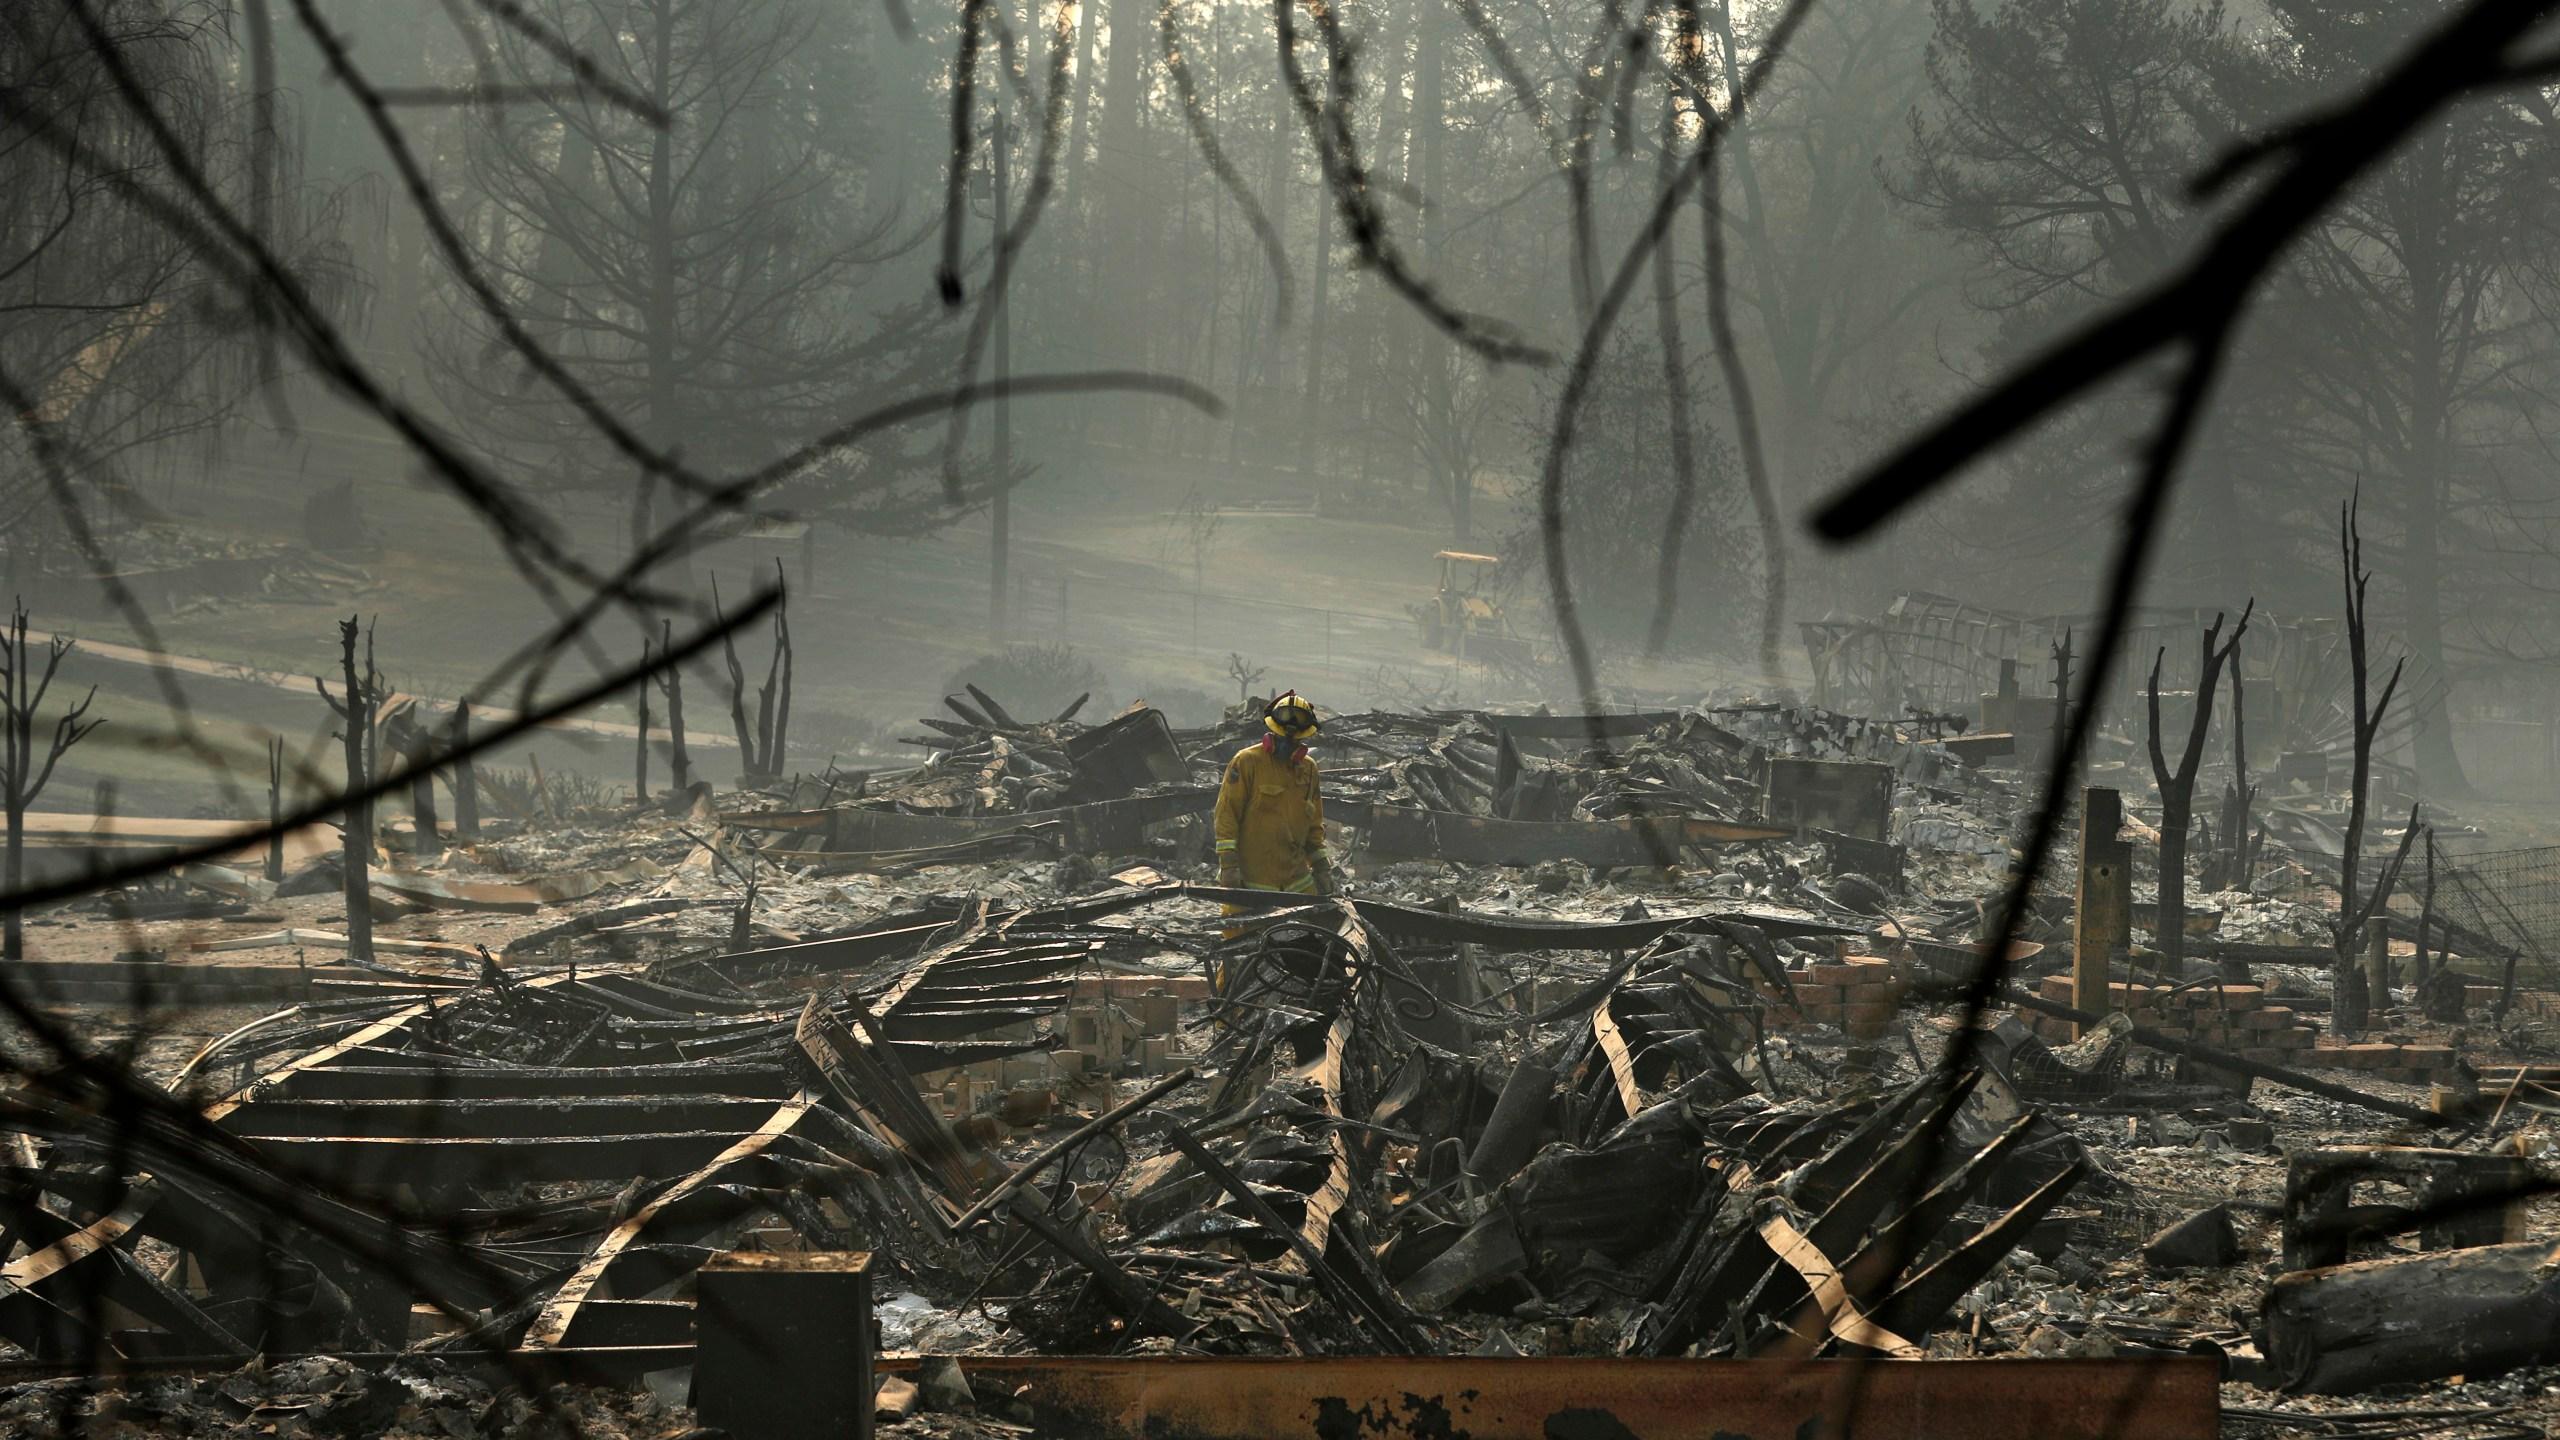 California_Wildfires_27179-159532.jpg17658800